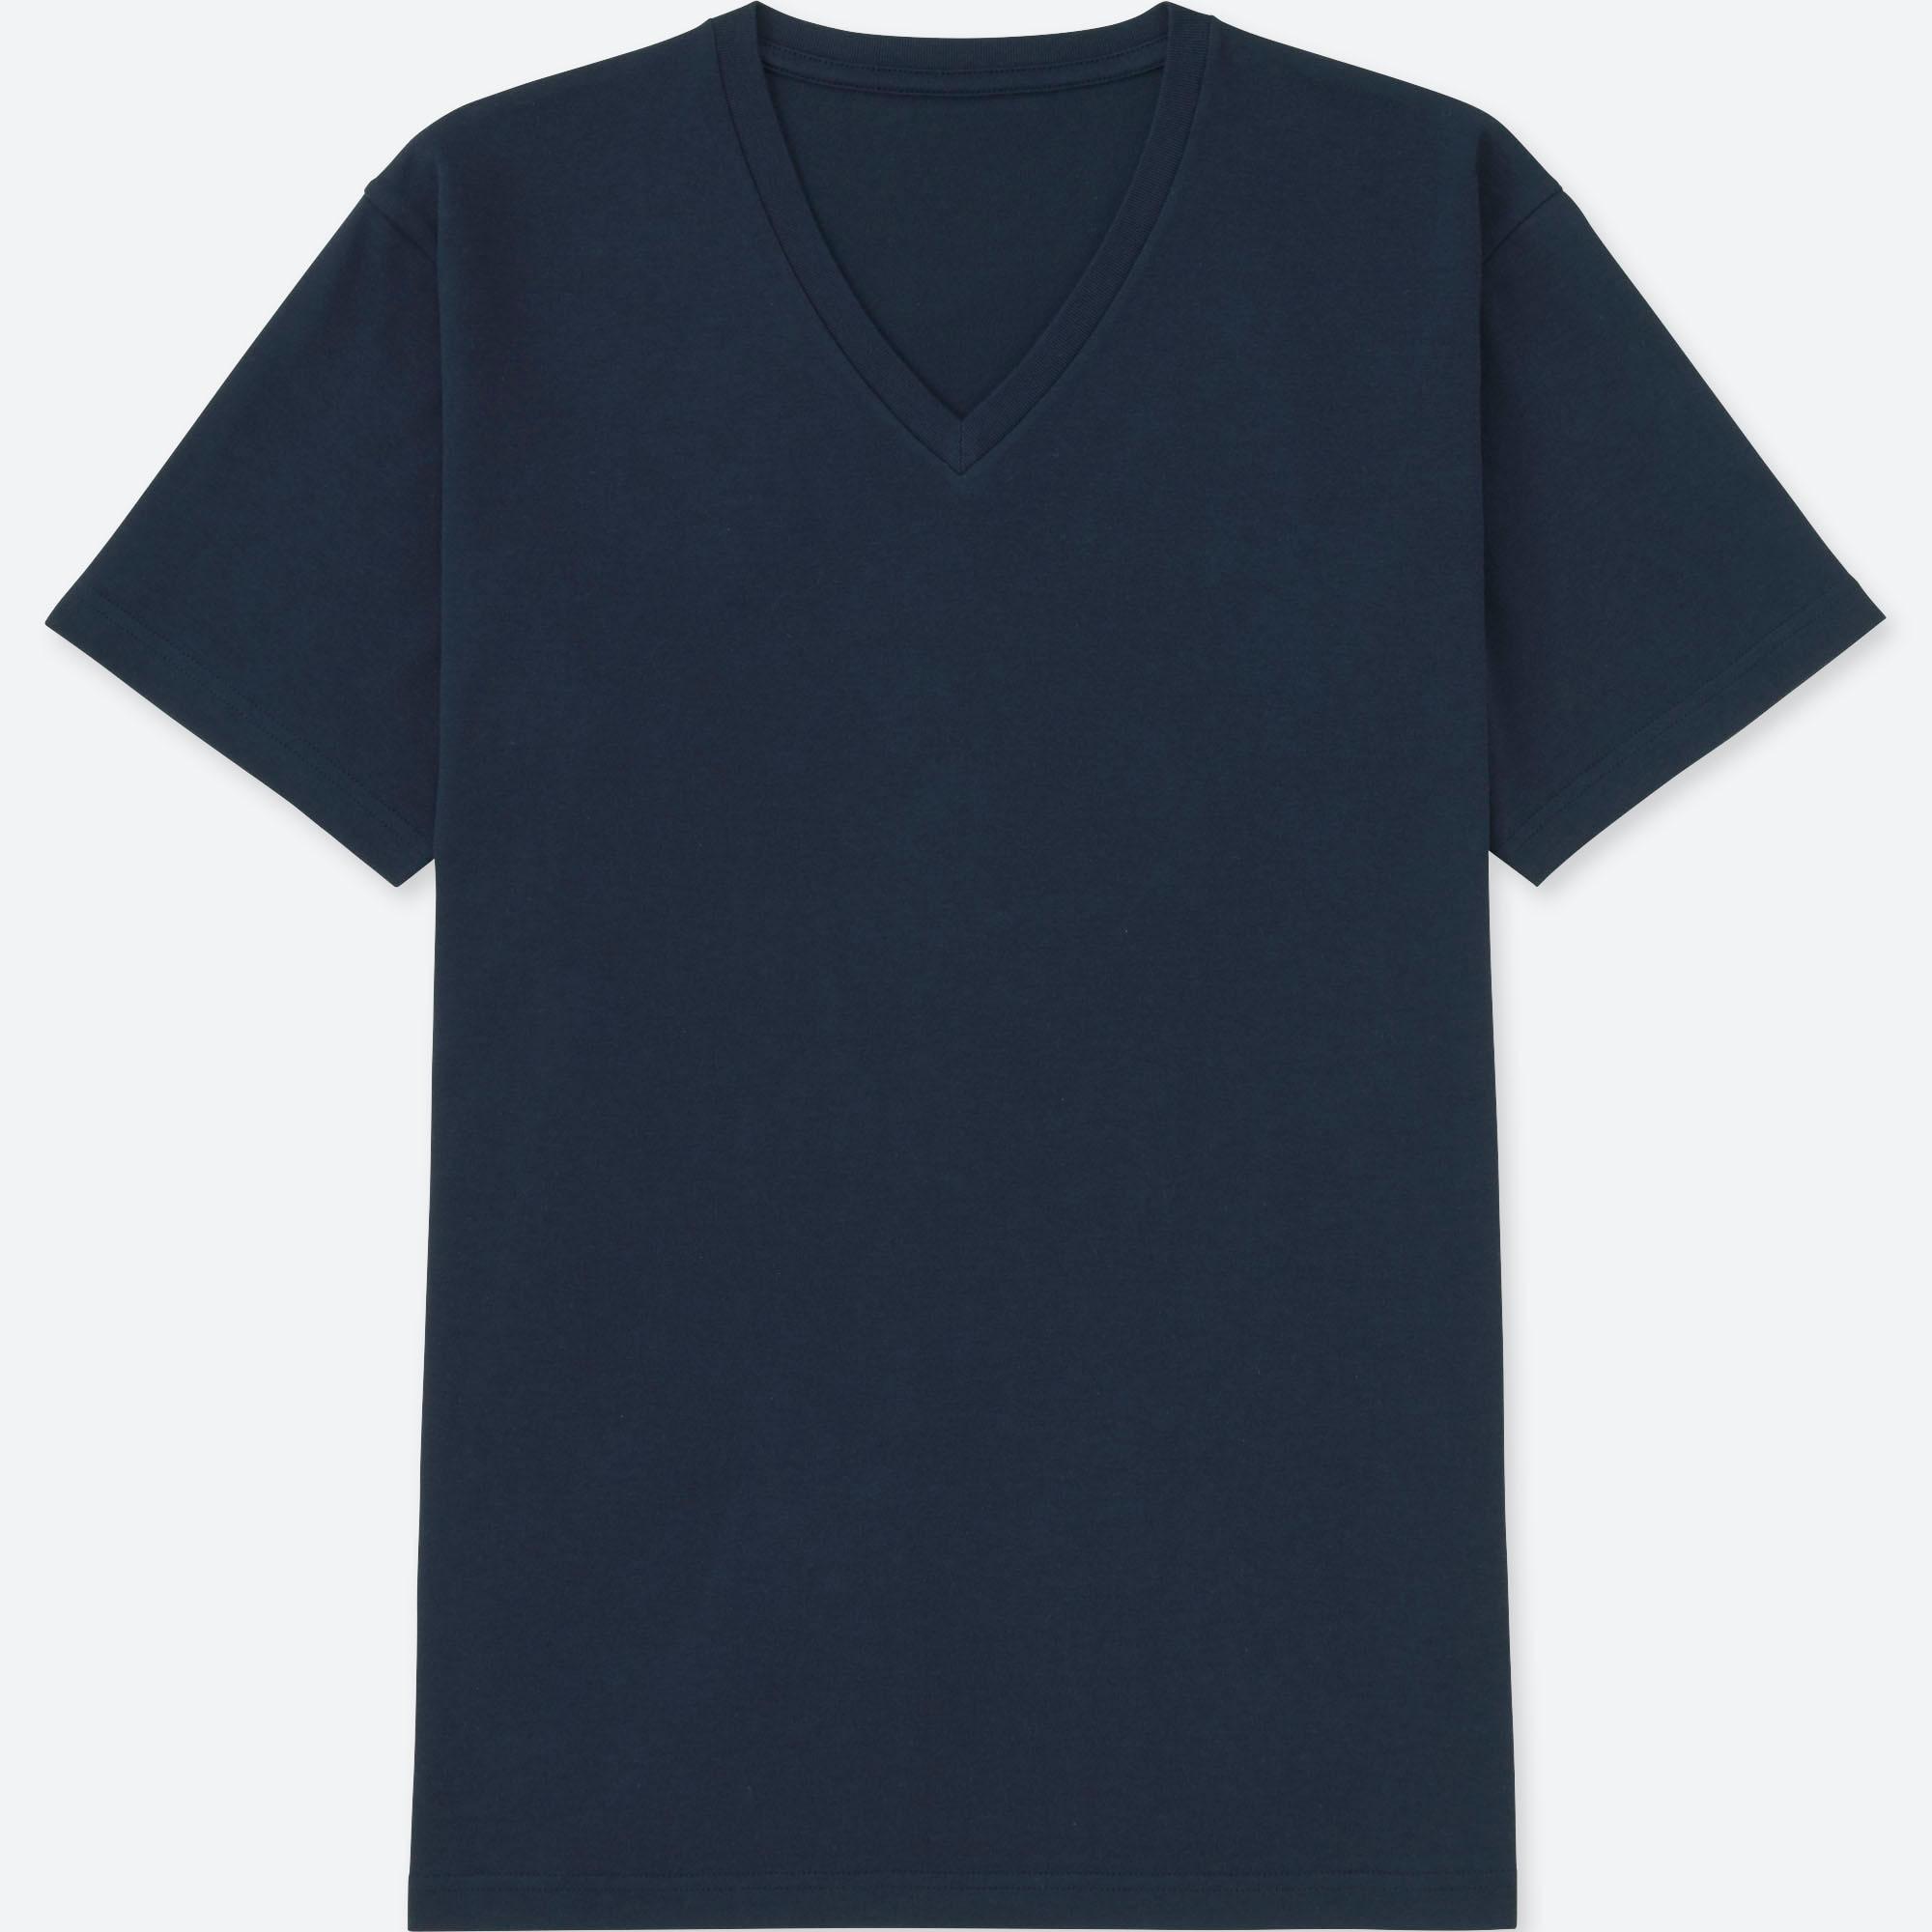 Uniqlo Heattech Crew Neck Short Sleeve T-shirt Small Men Navy